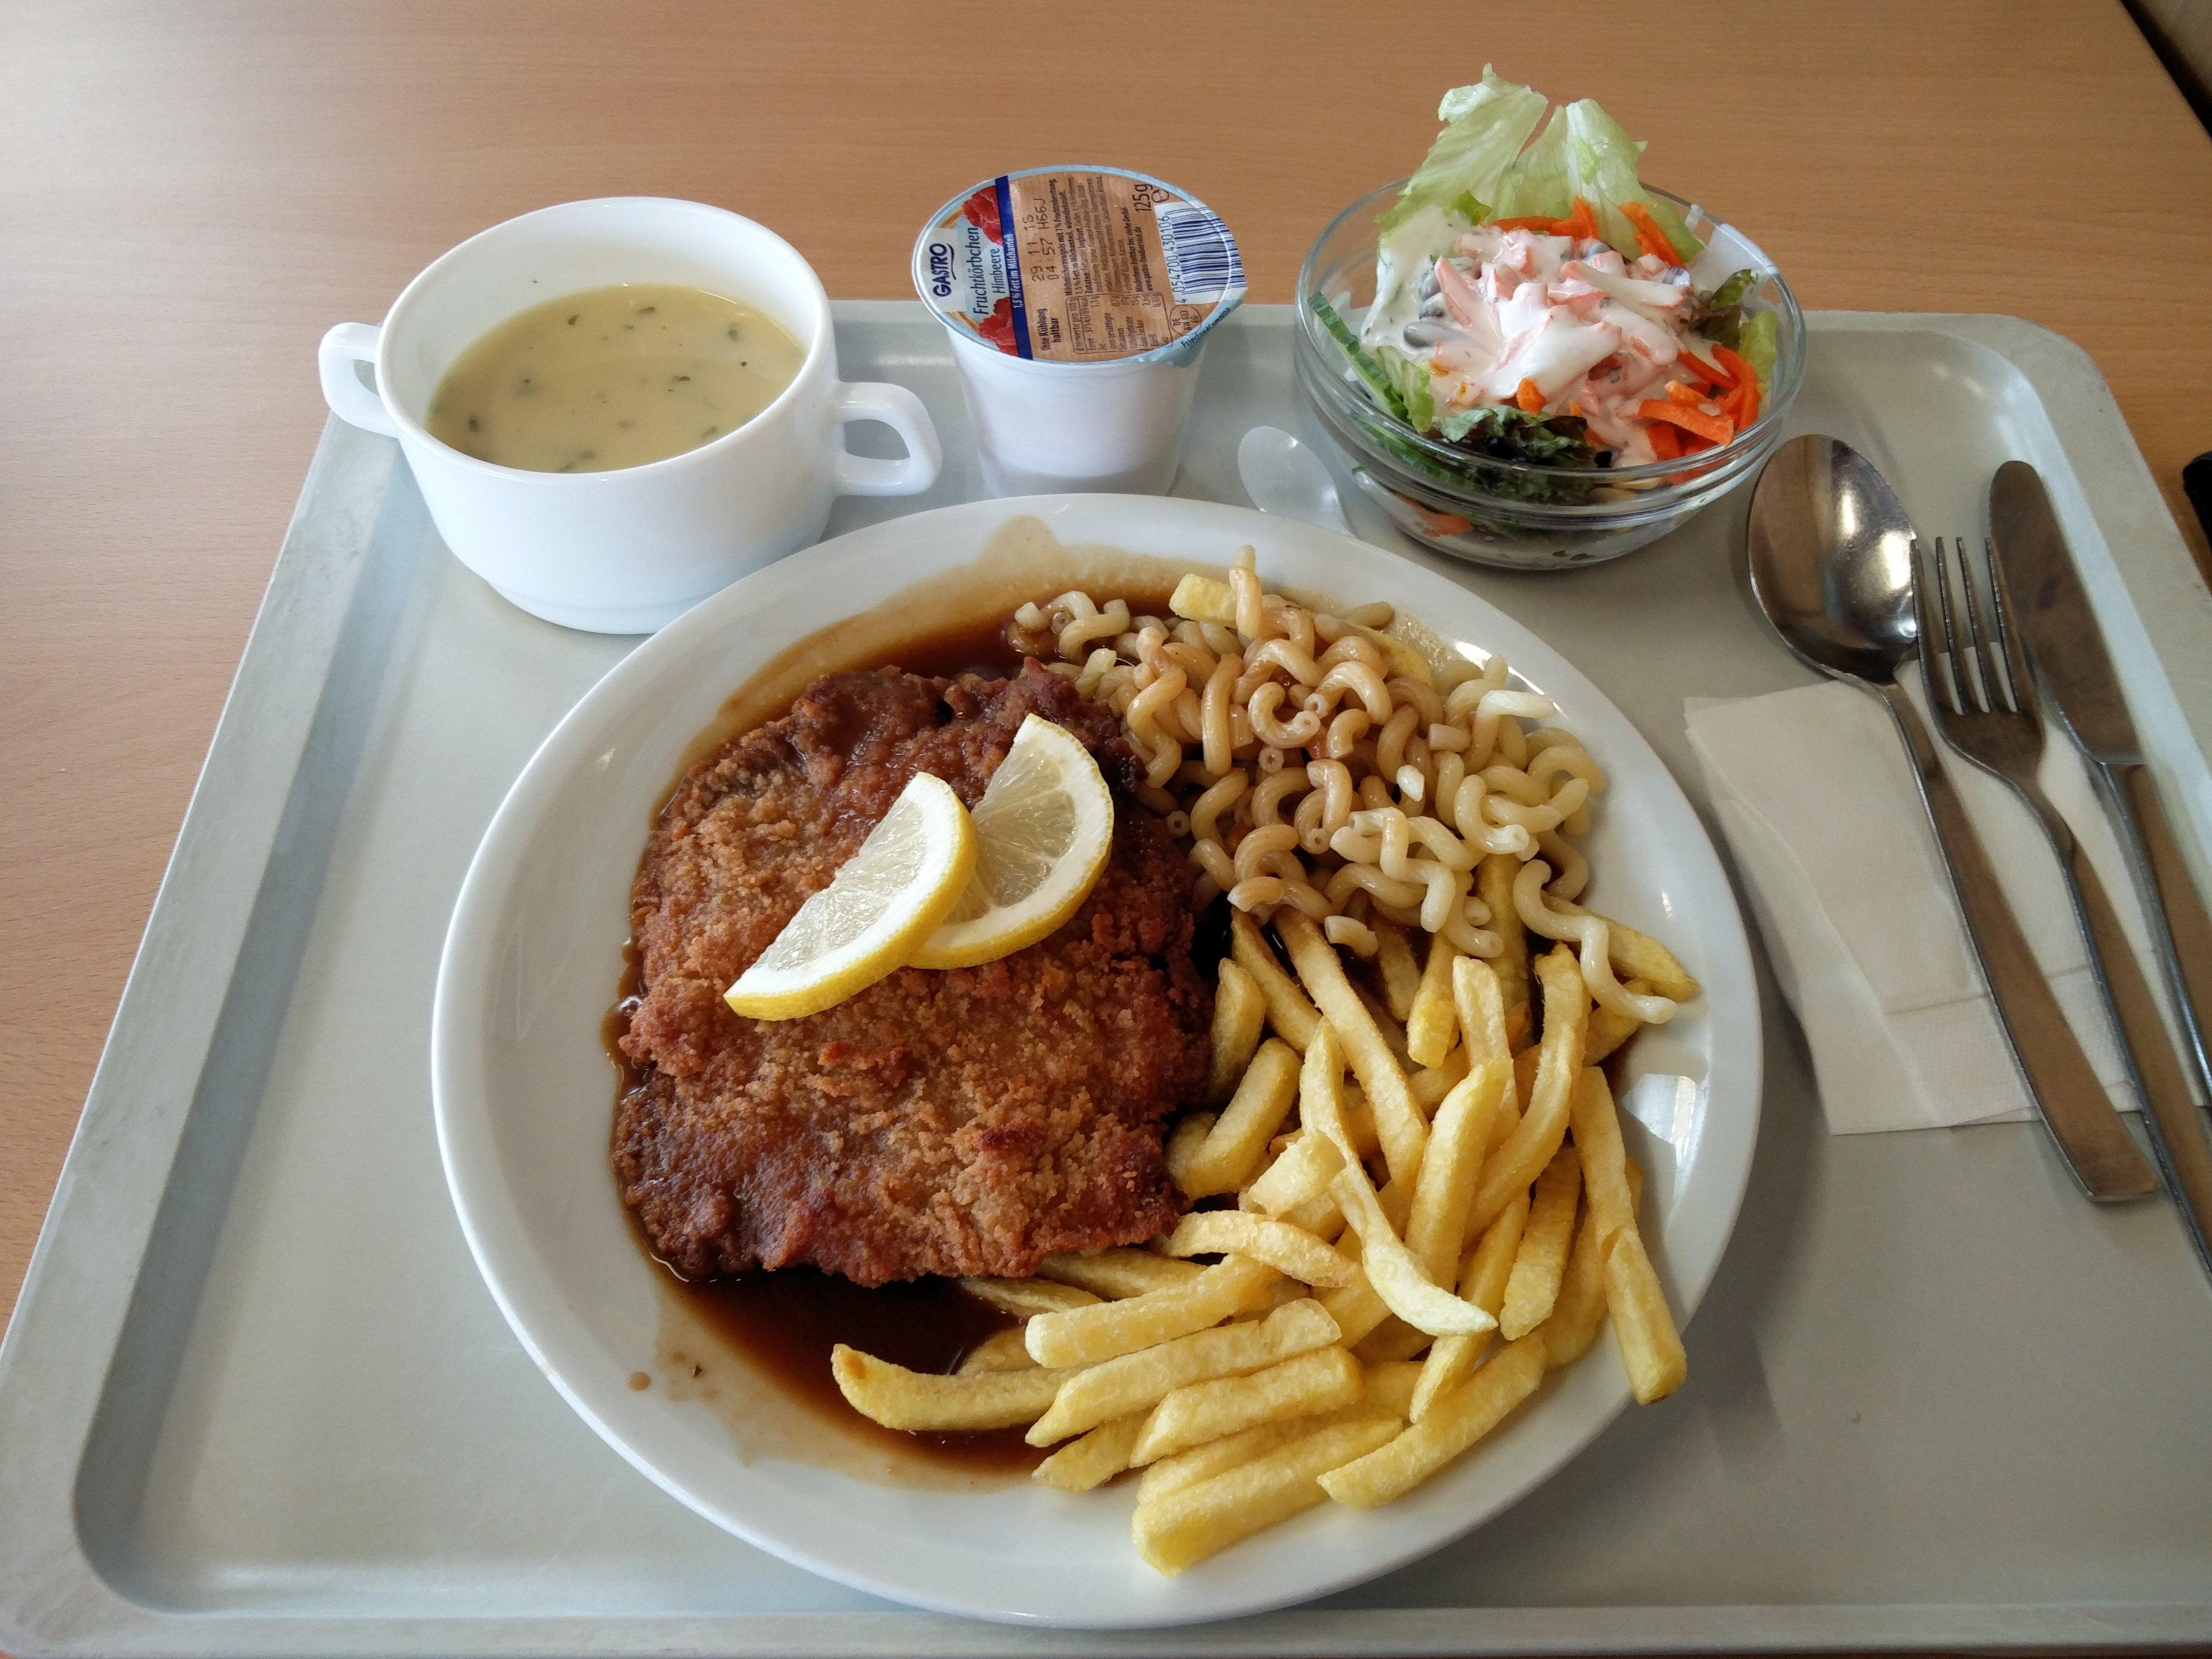 https://foodloader.net/nico_2016-11-10_paniertes-schnitzel-nudeln-pommes-suppe-salat-joghurt.jpg